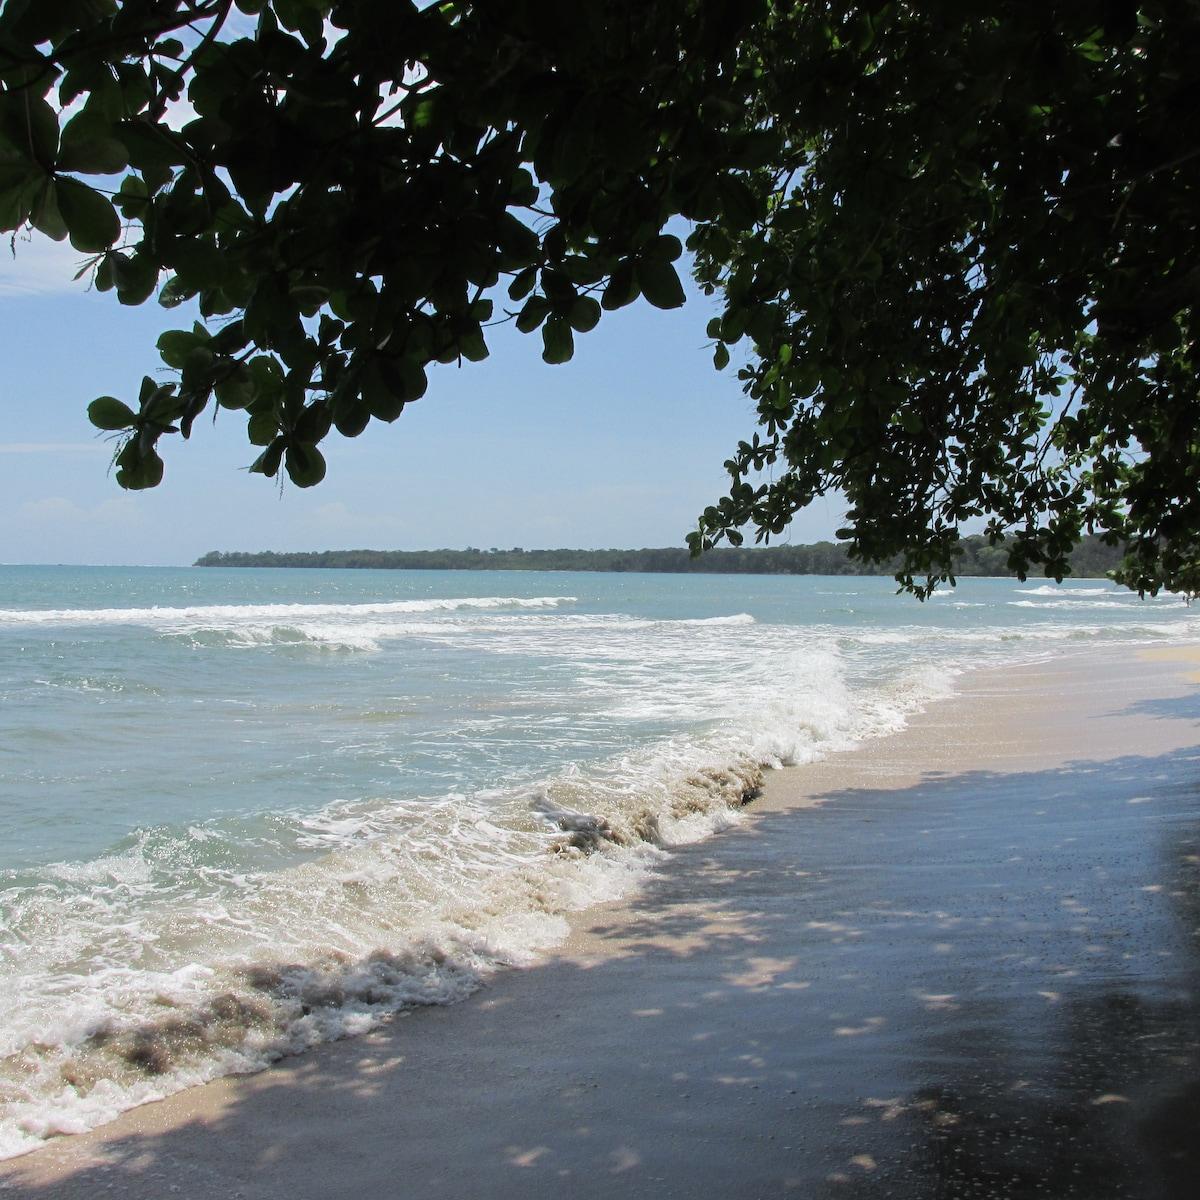 Warm Caribbean waters.